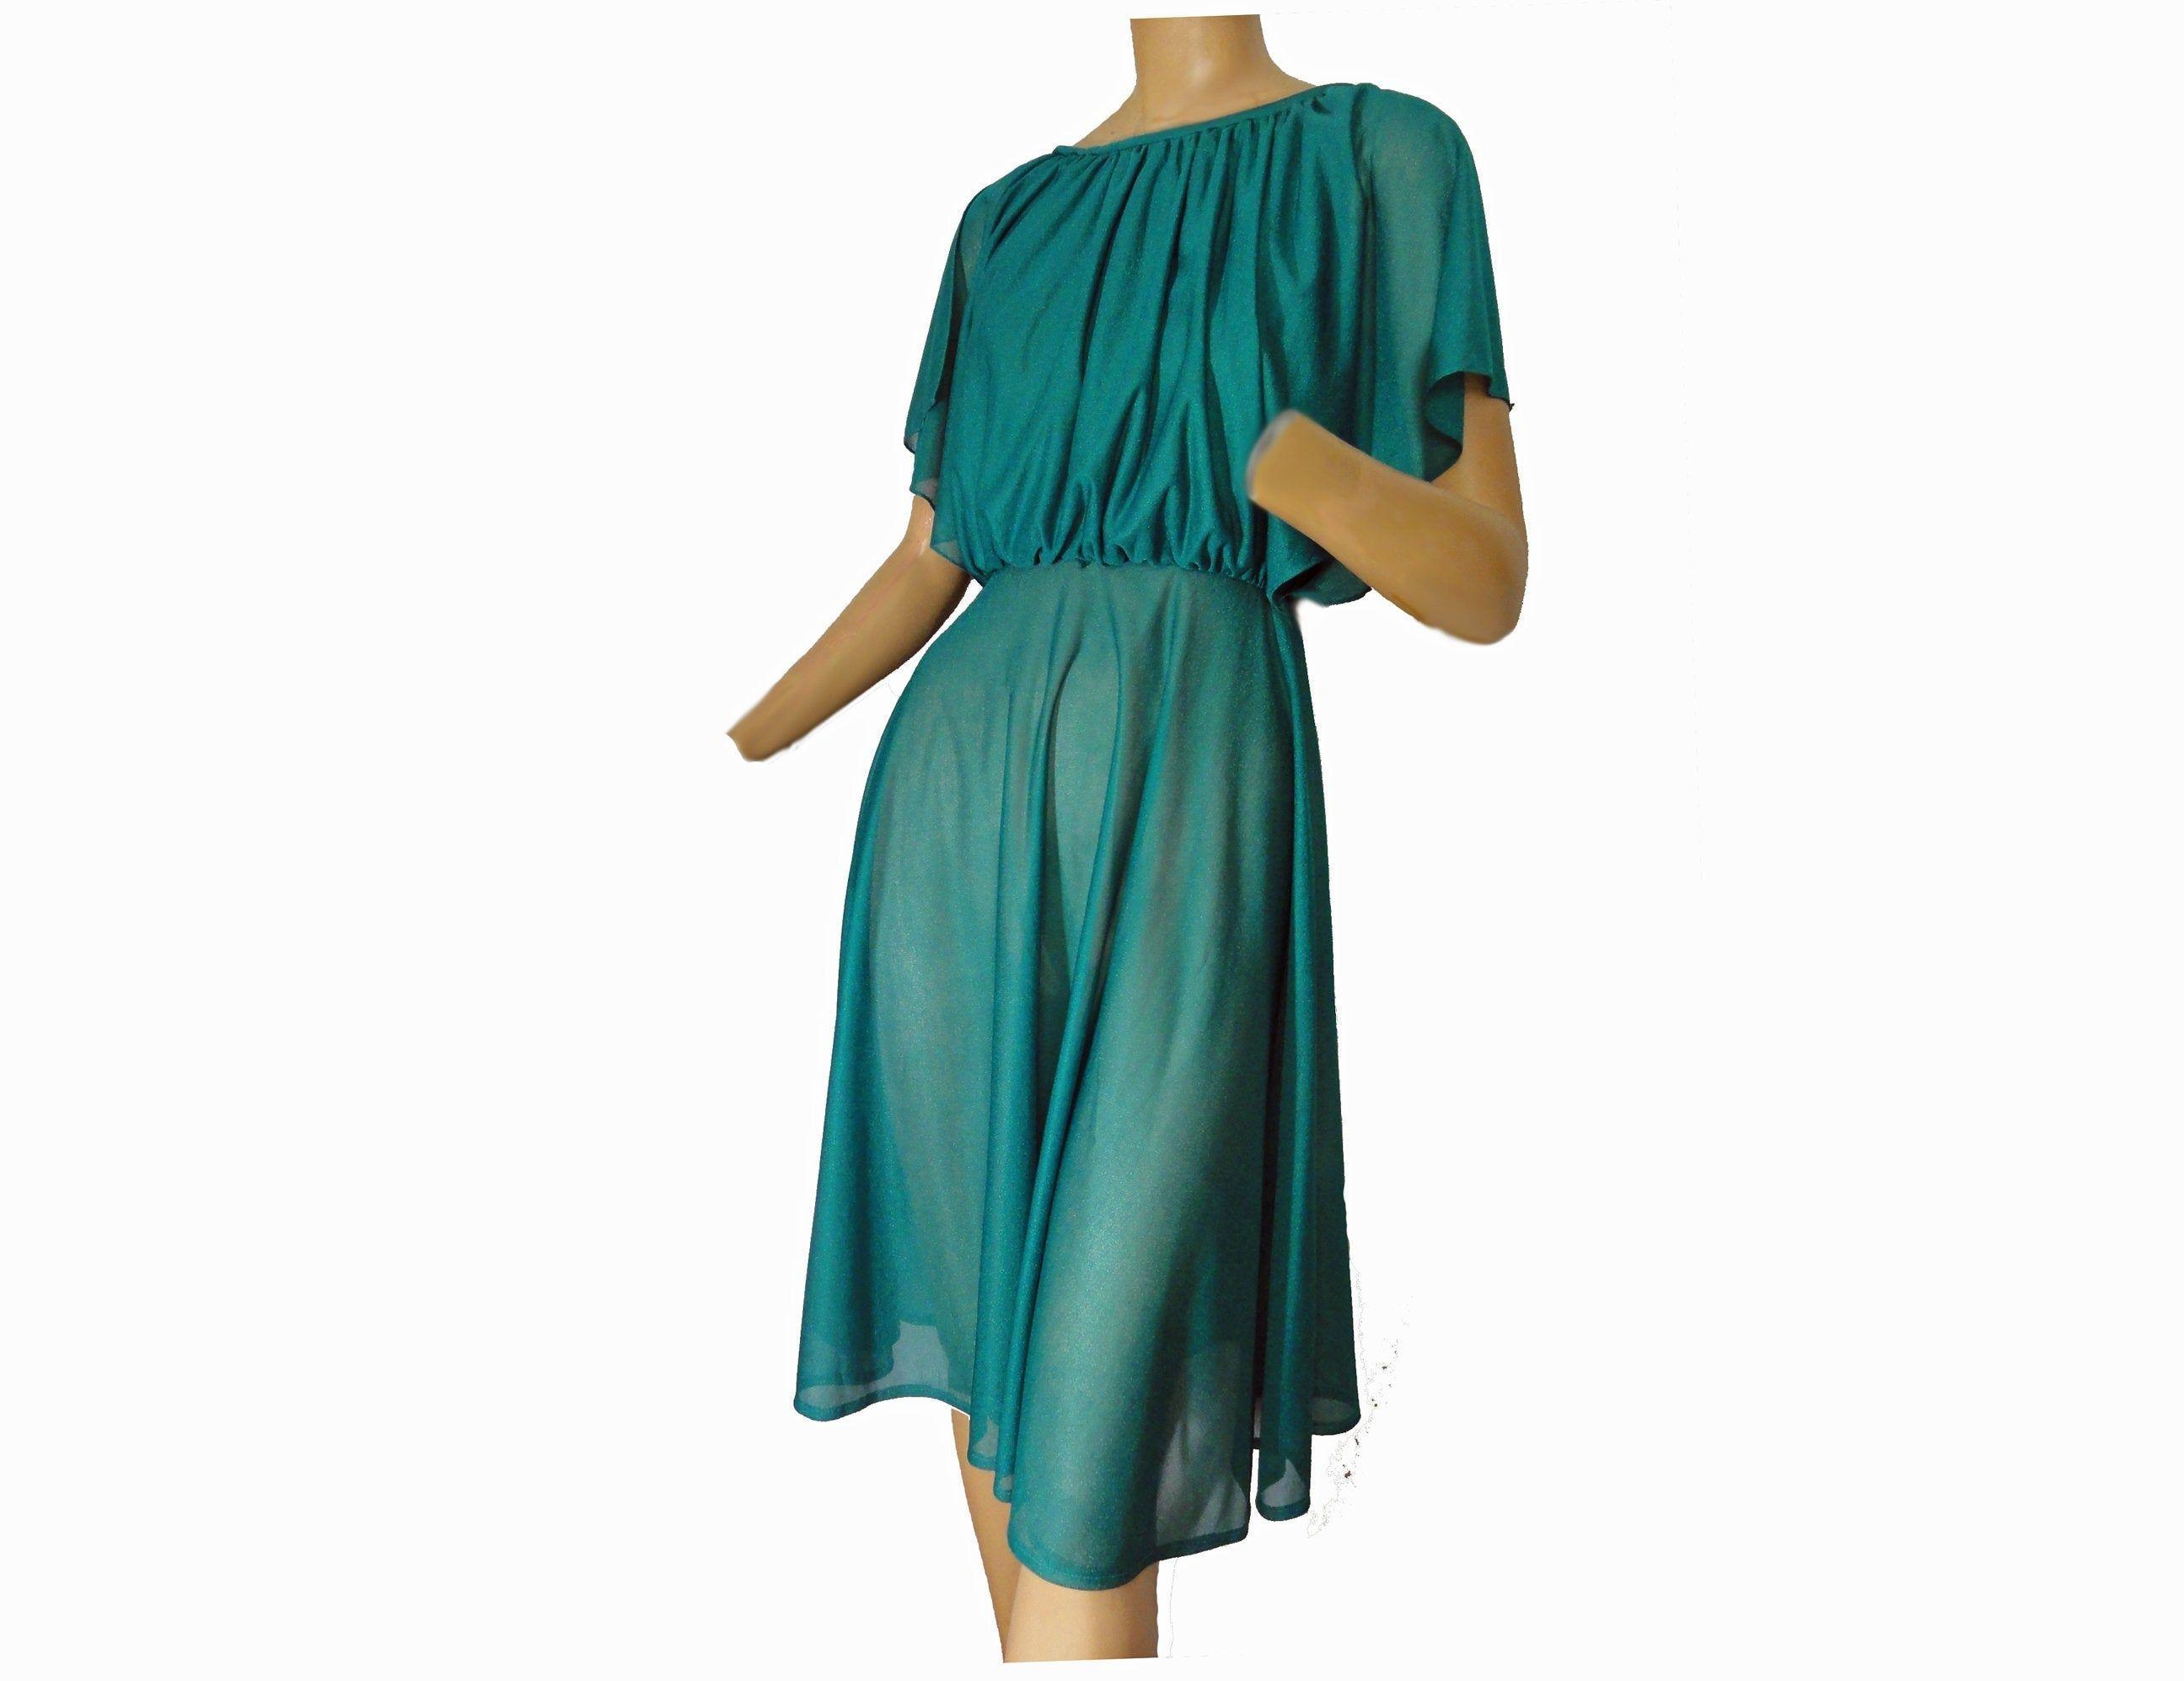 Vintage Greek Goddess 70s Party Dress Sheer Green Disco Dance Etsy Sheer Dress Party Dress 70s Maxi Dress [ 1994 x 2591 Pixel ]